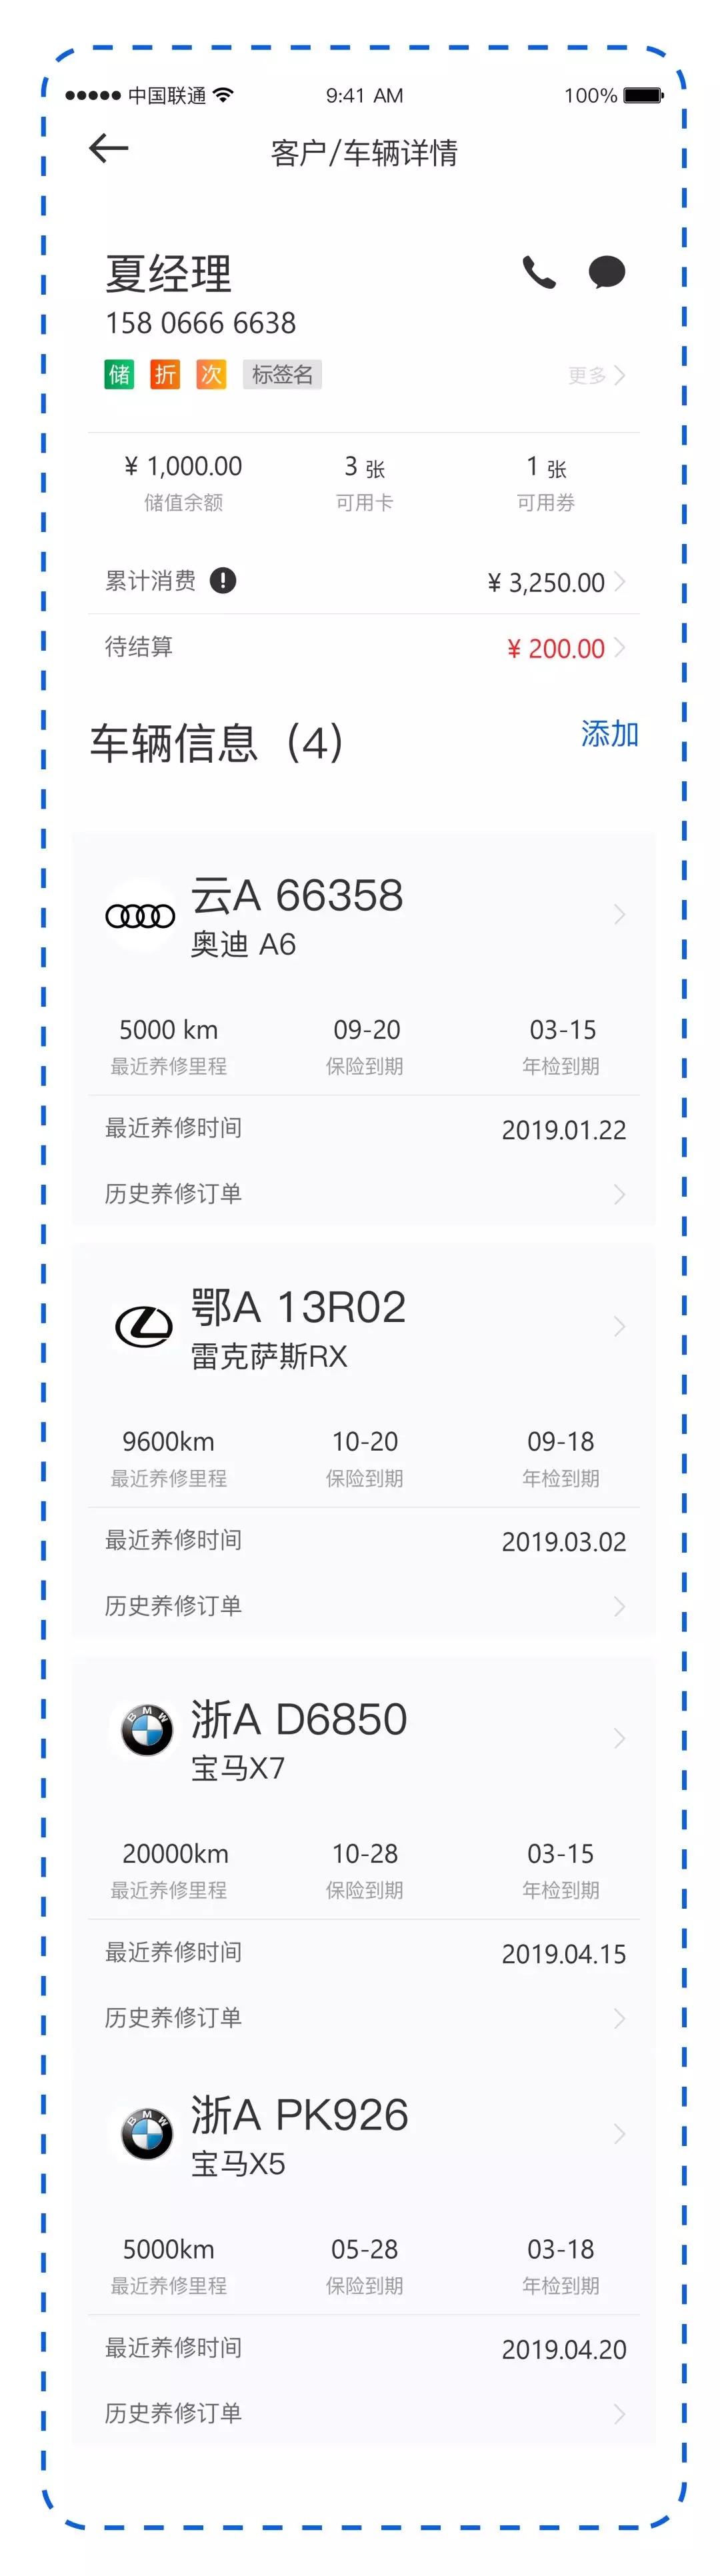 https://static-oss-chebian.oss-cn-beijing.aliyuncs.com/public/1561106320411.jpg